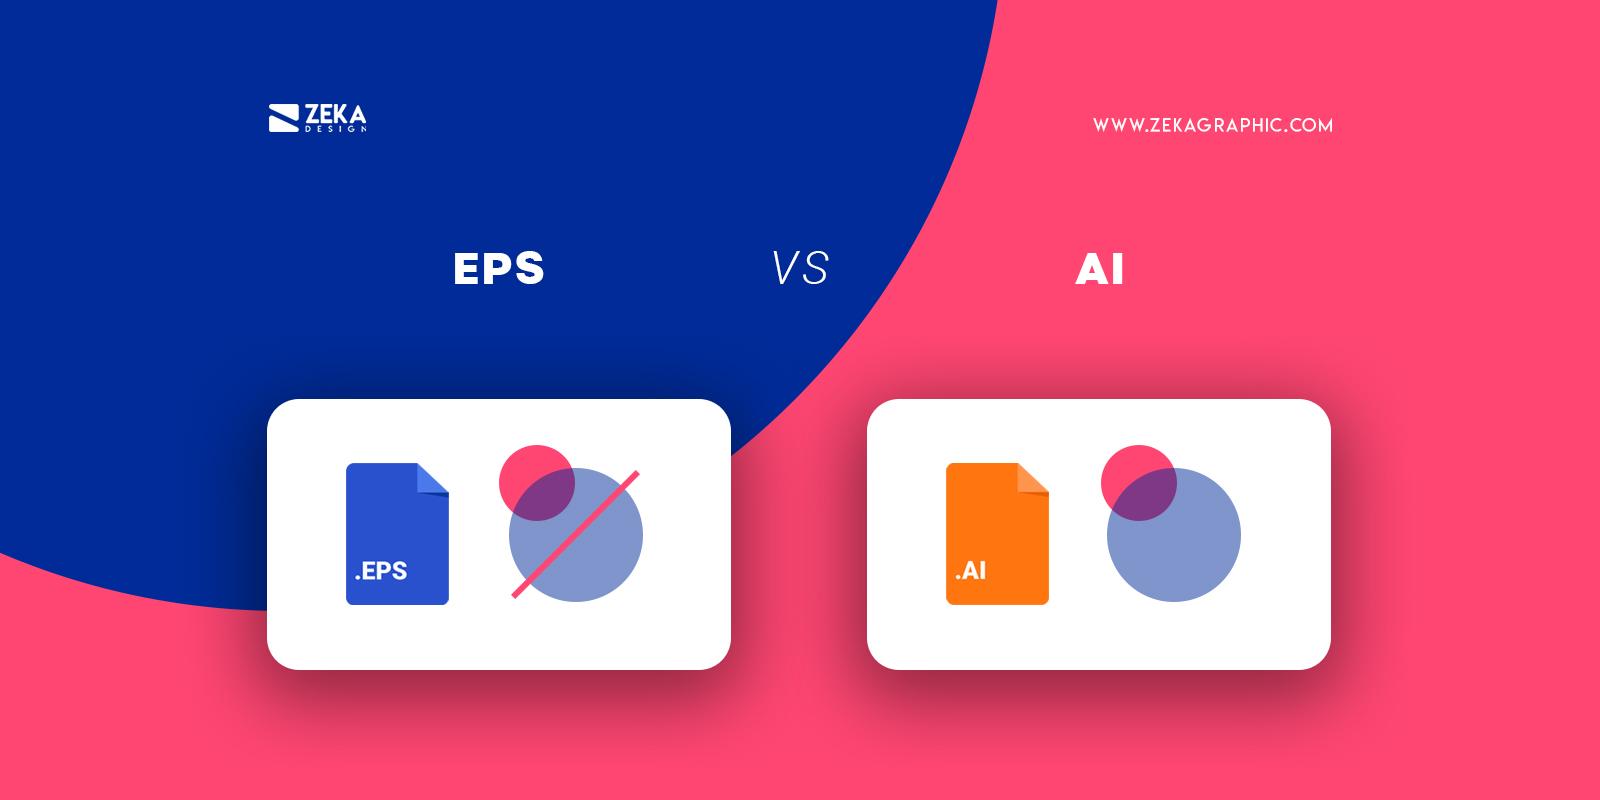 EPS vs AI File Format Graphic Design Terms Explained